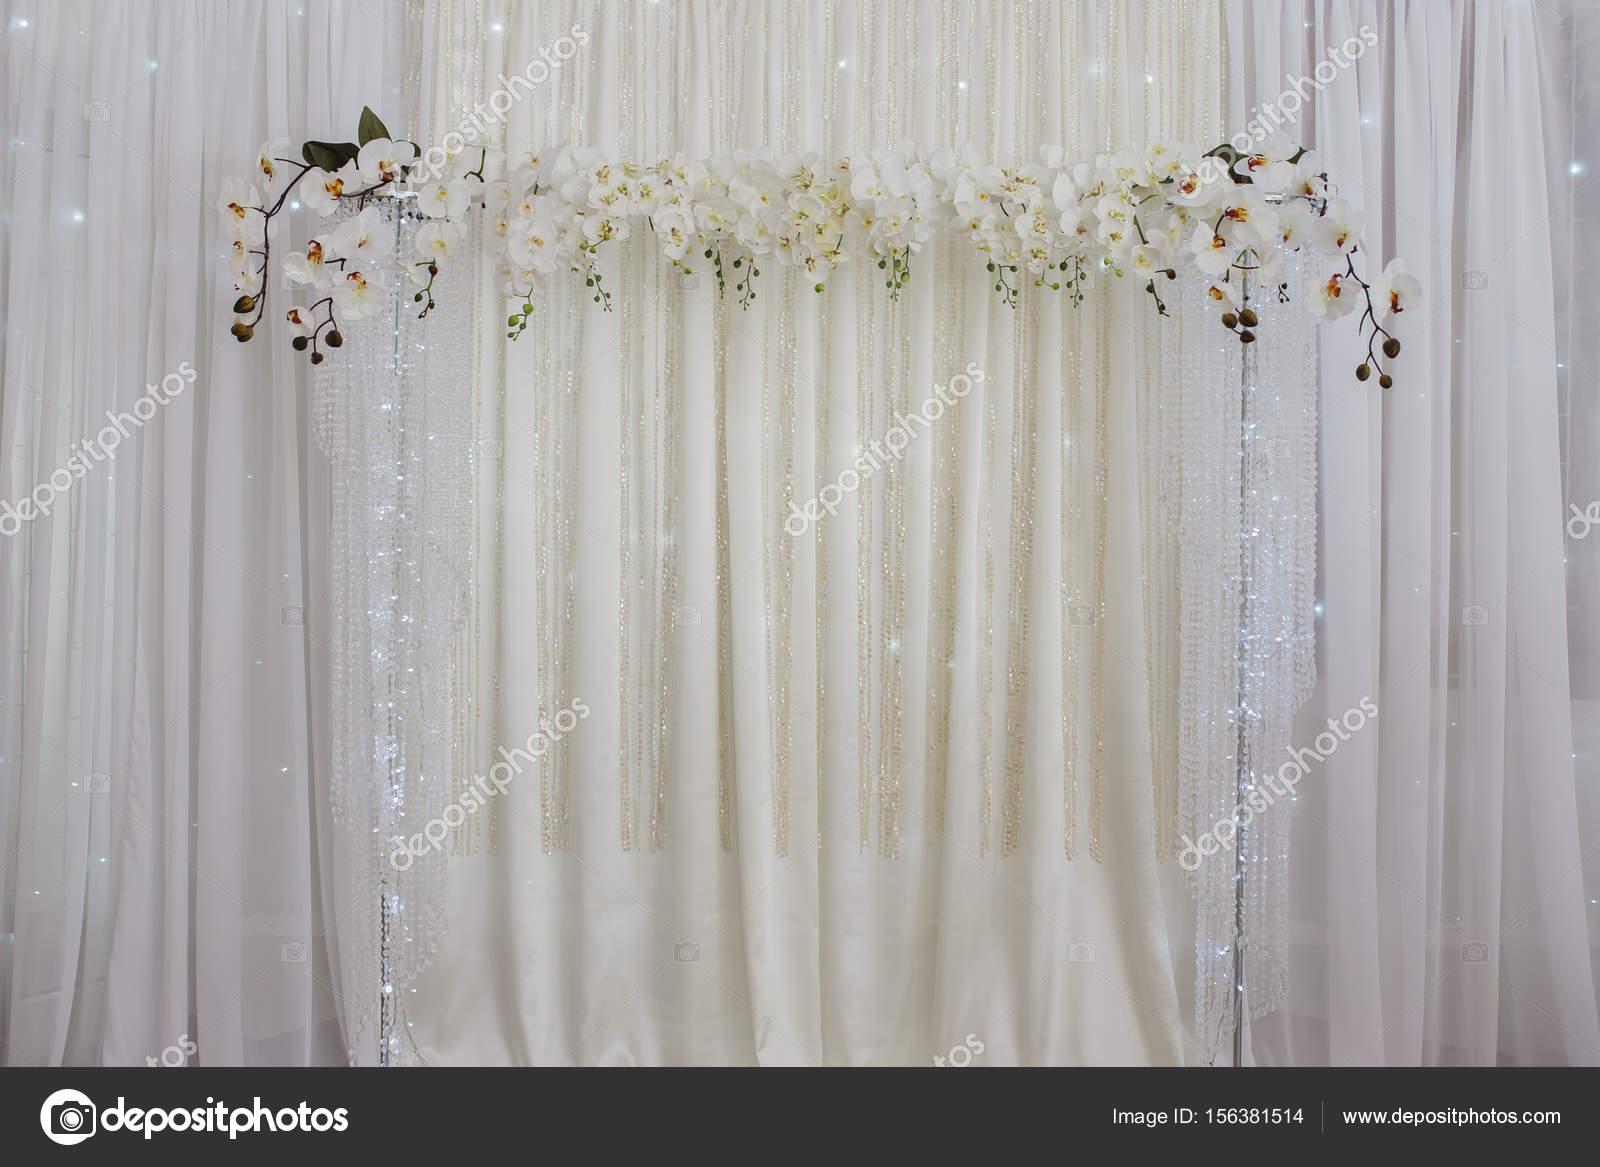 Hochzeit Dekoration Blumen Wand Stockfoto C Lelik83 156381514